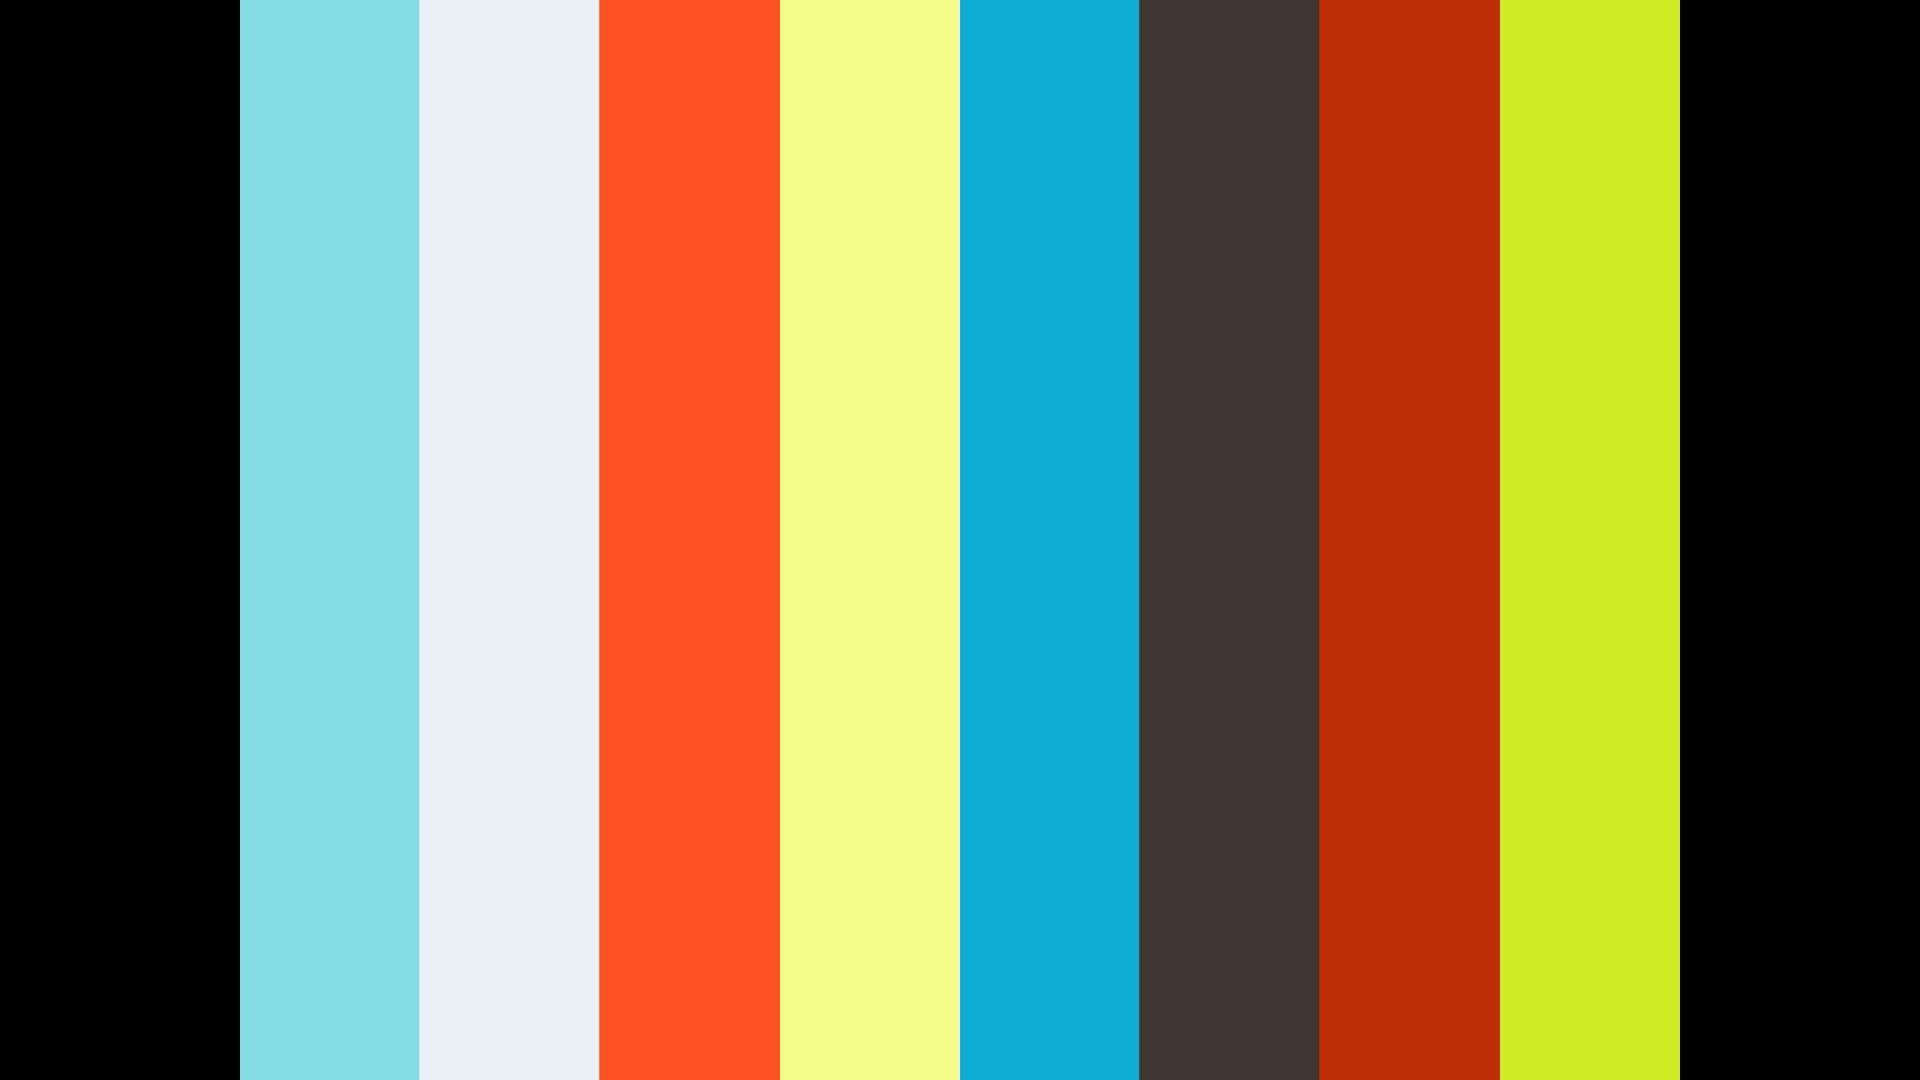 ECON 2018: Brent Crowe